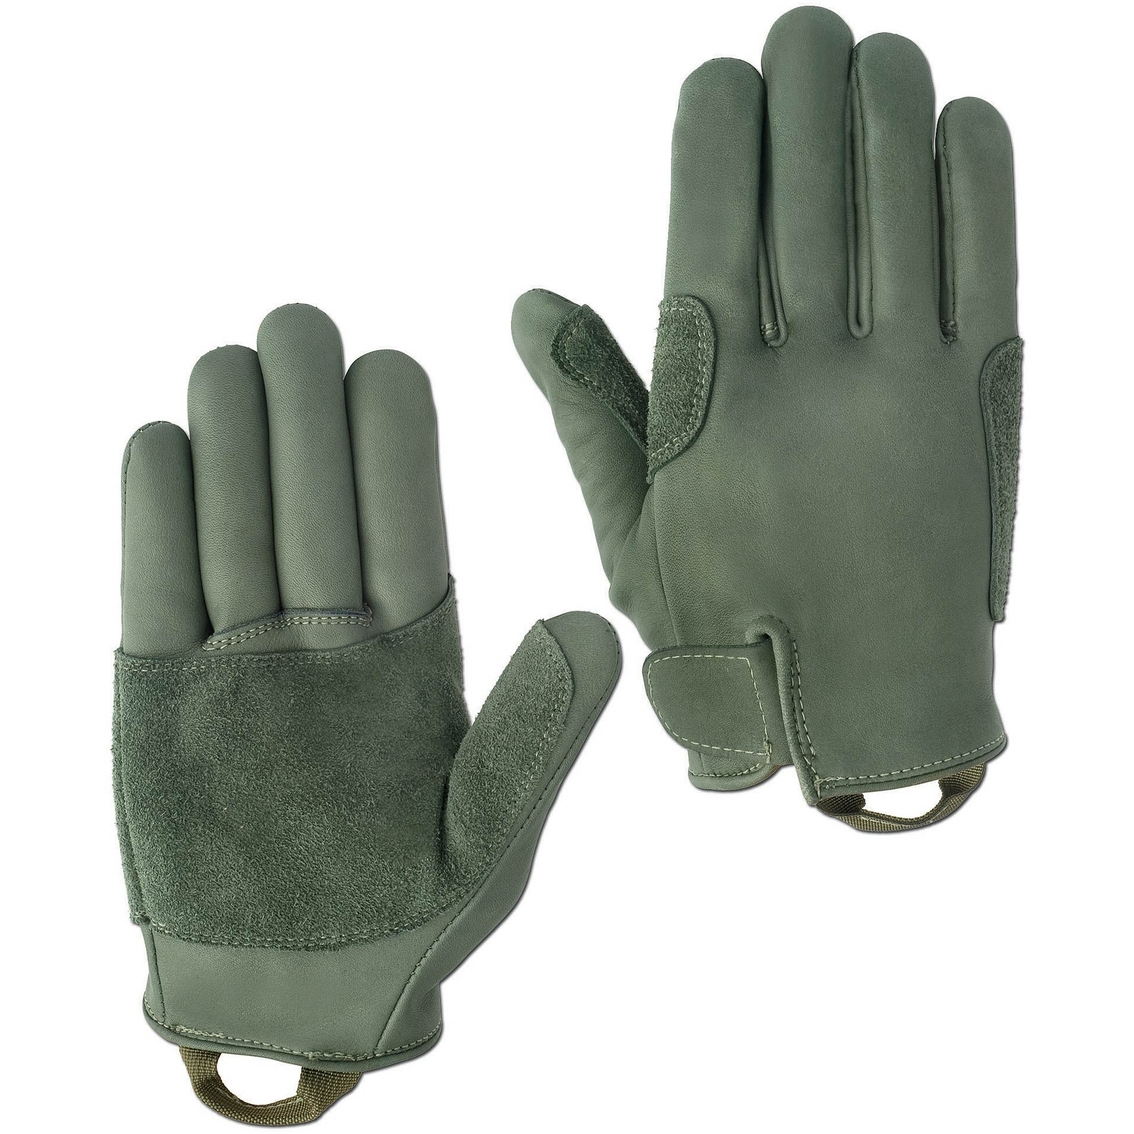 Leather work gloves made in the usa - Ansell Activarmr Flexor Light Duty Utility Work Gloves Medium